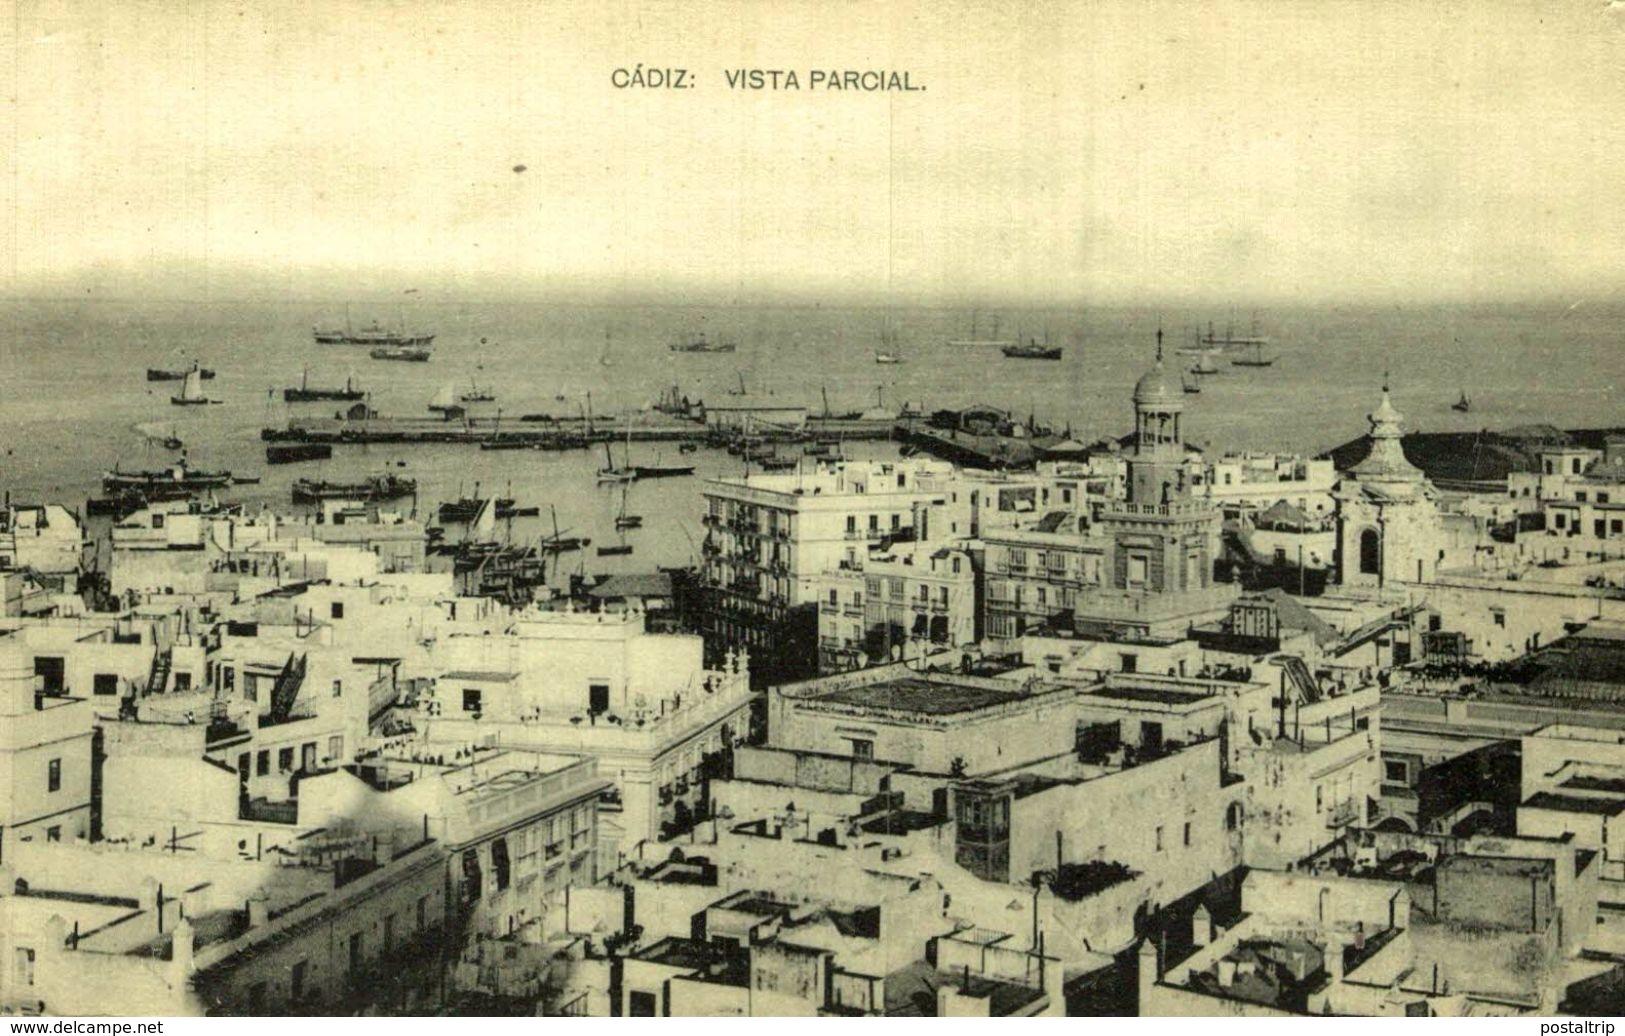 CADIZ. VISTA PARCIAL. - HAUSER Y MENET - Cádiz